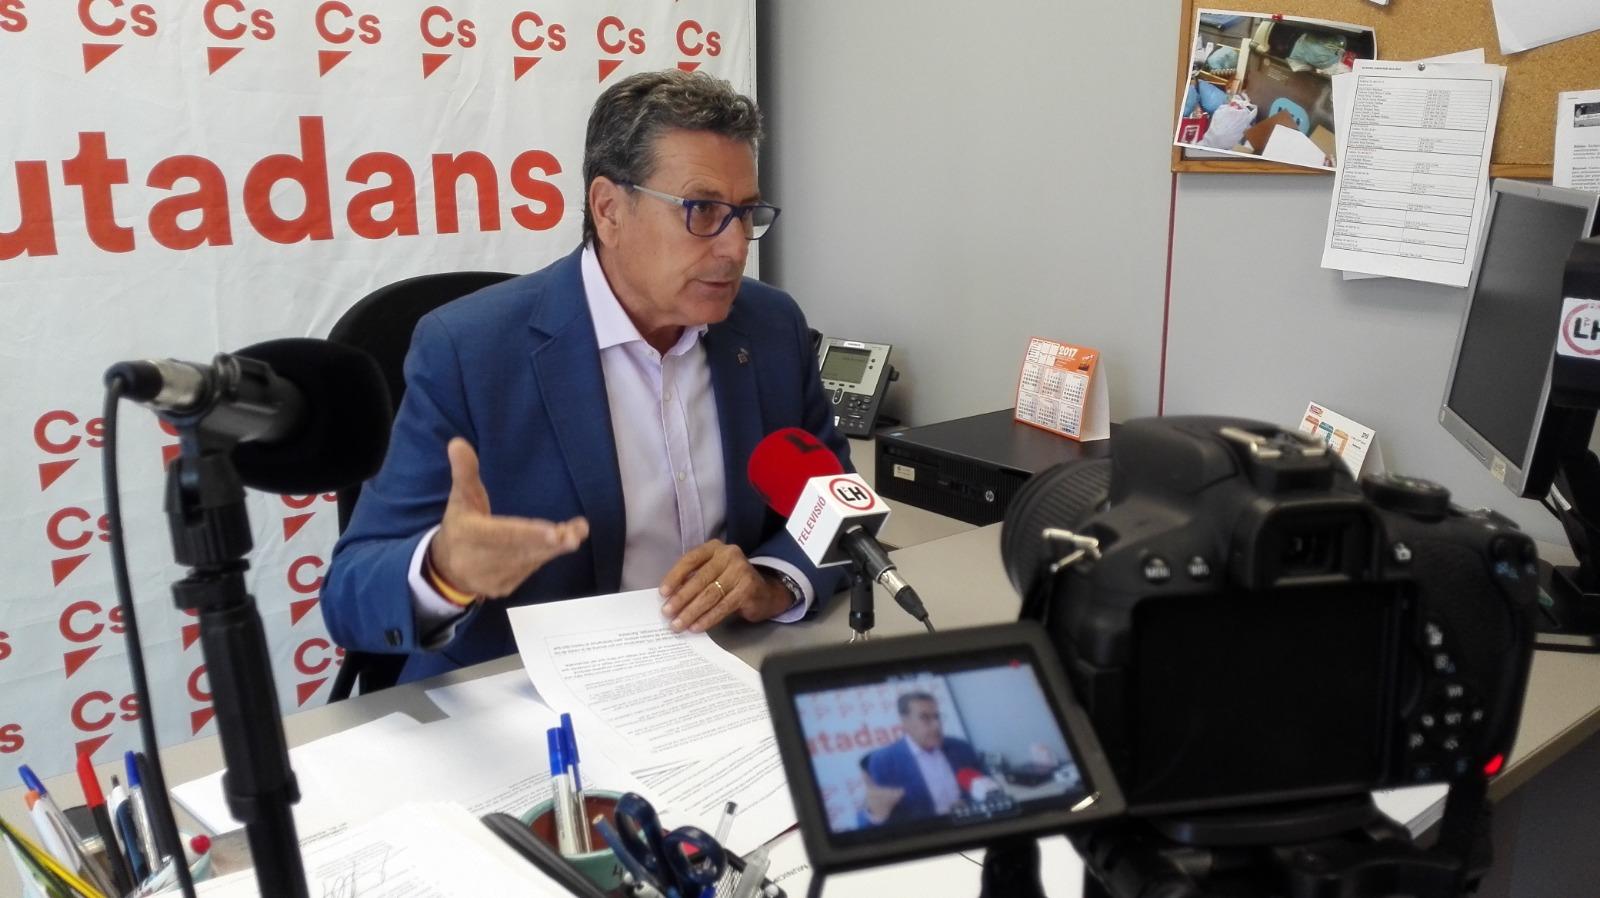 El portavoz de Cs en l'Hospitalet de Llobregat, Miguel García, durante una rueda de prensa